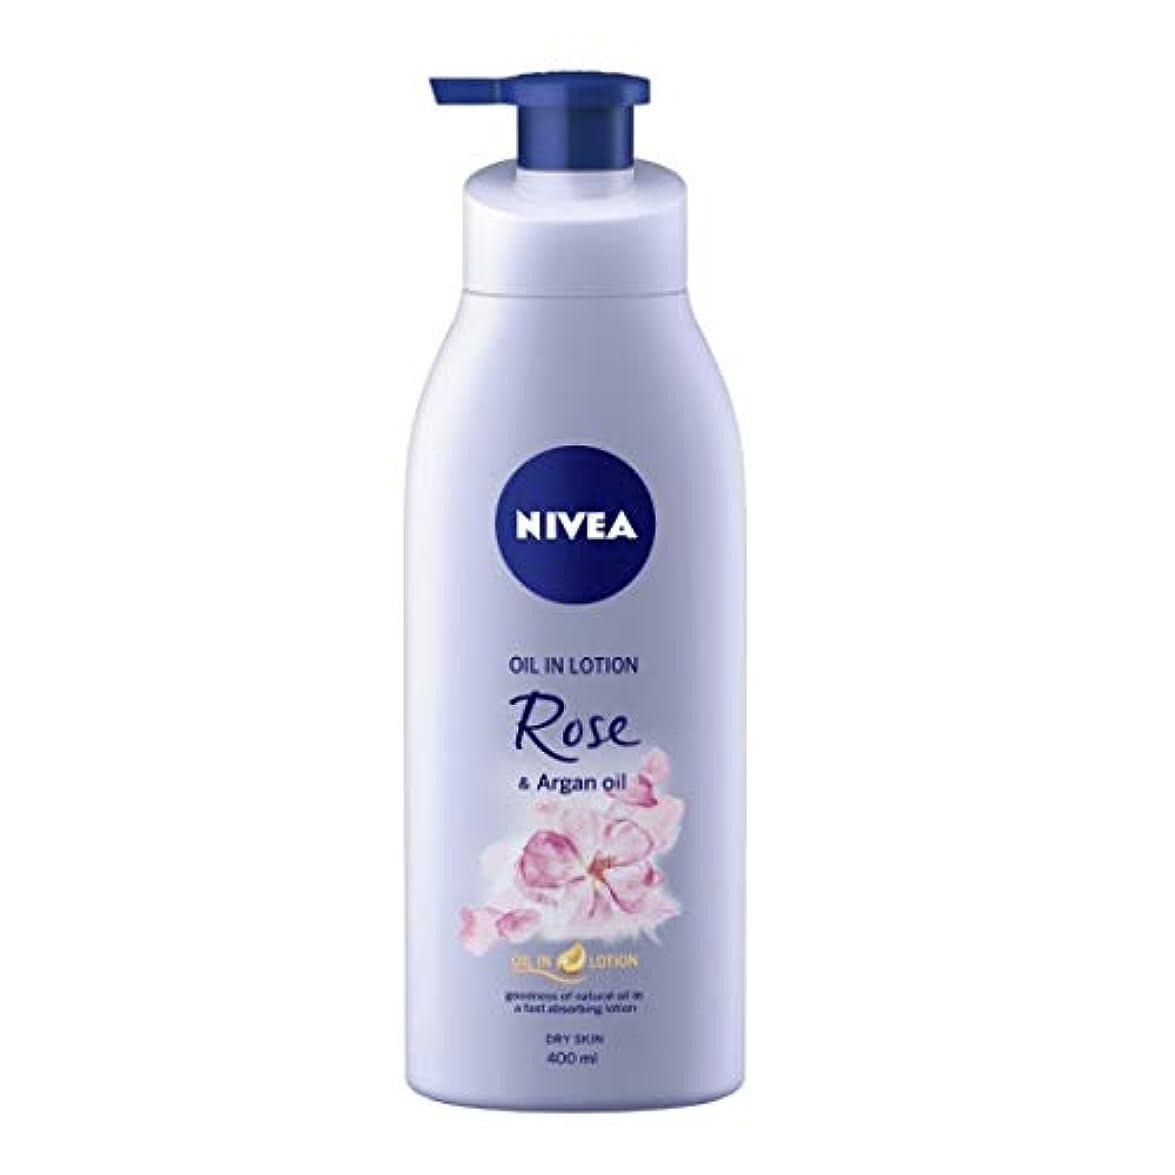 NIVEA Oil in Lotion, Rose and Argan Oil, 400ml